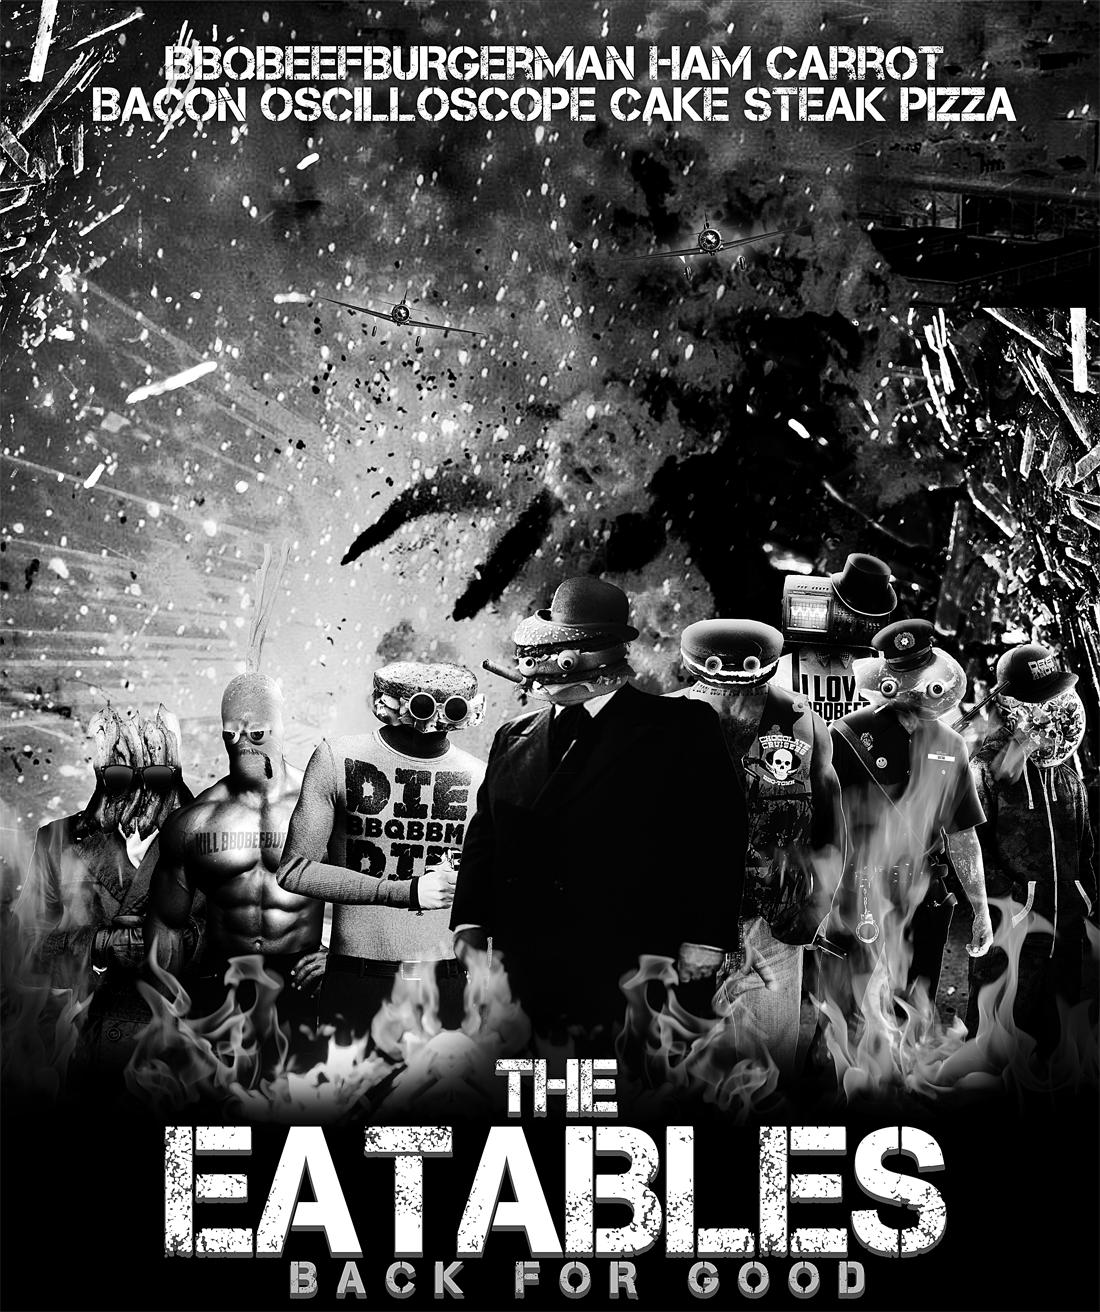 THE EATABLES